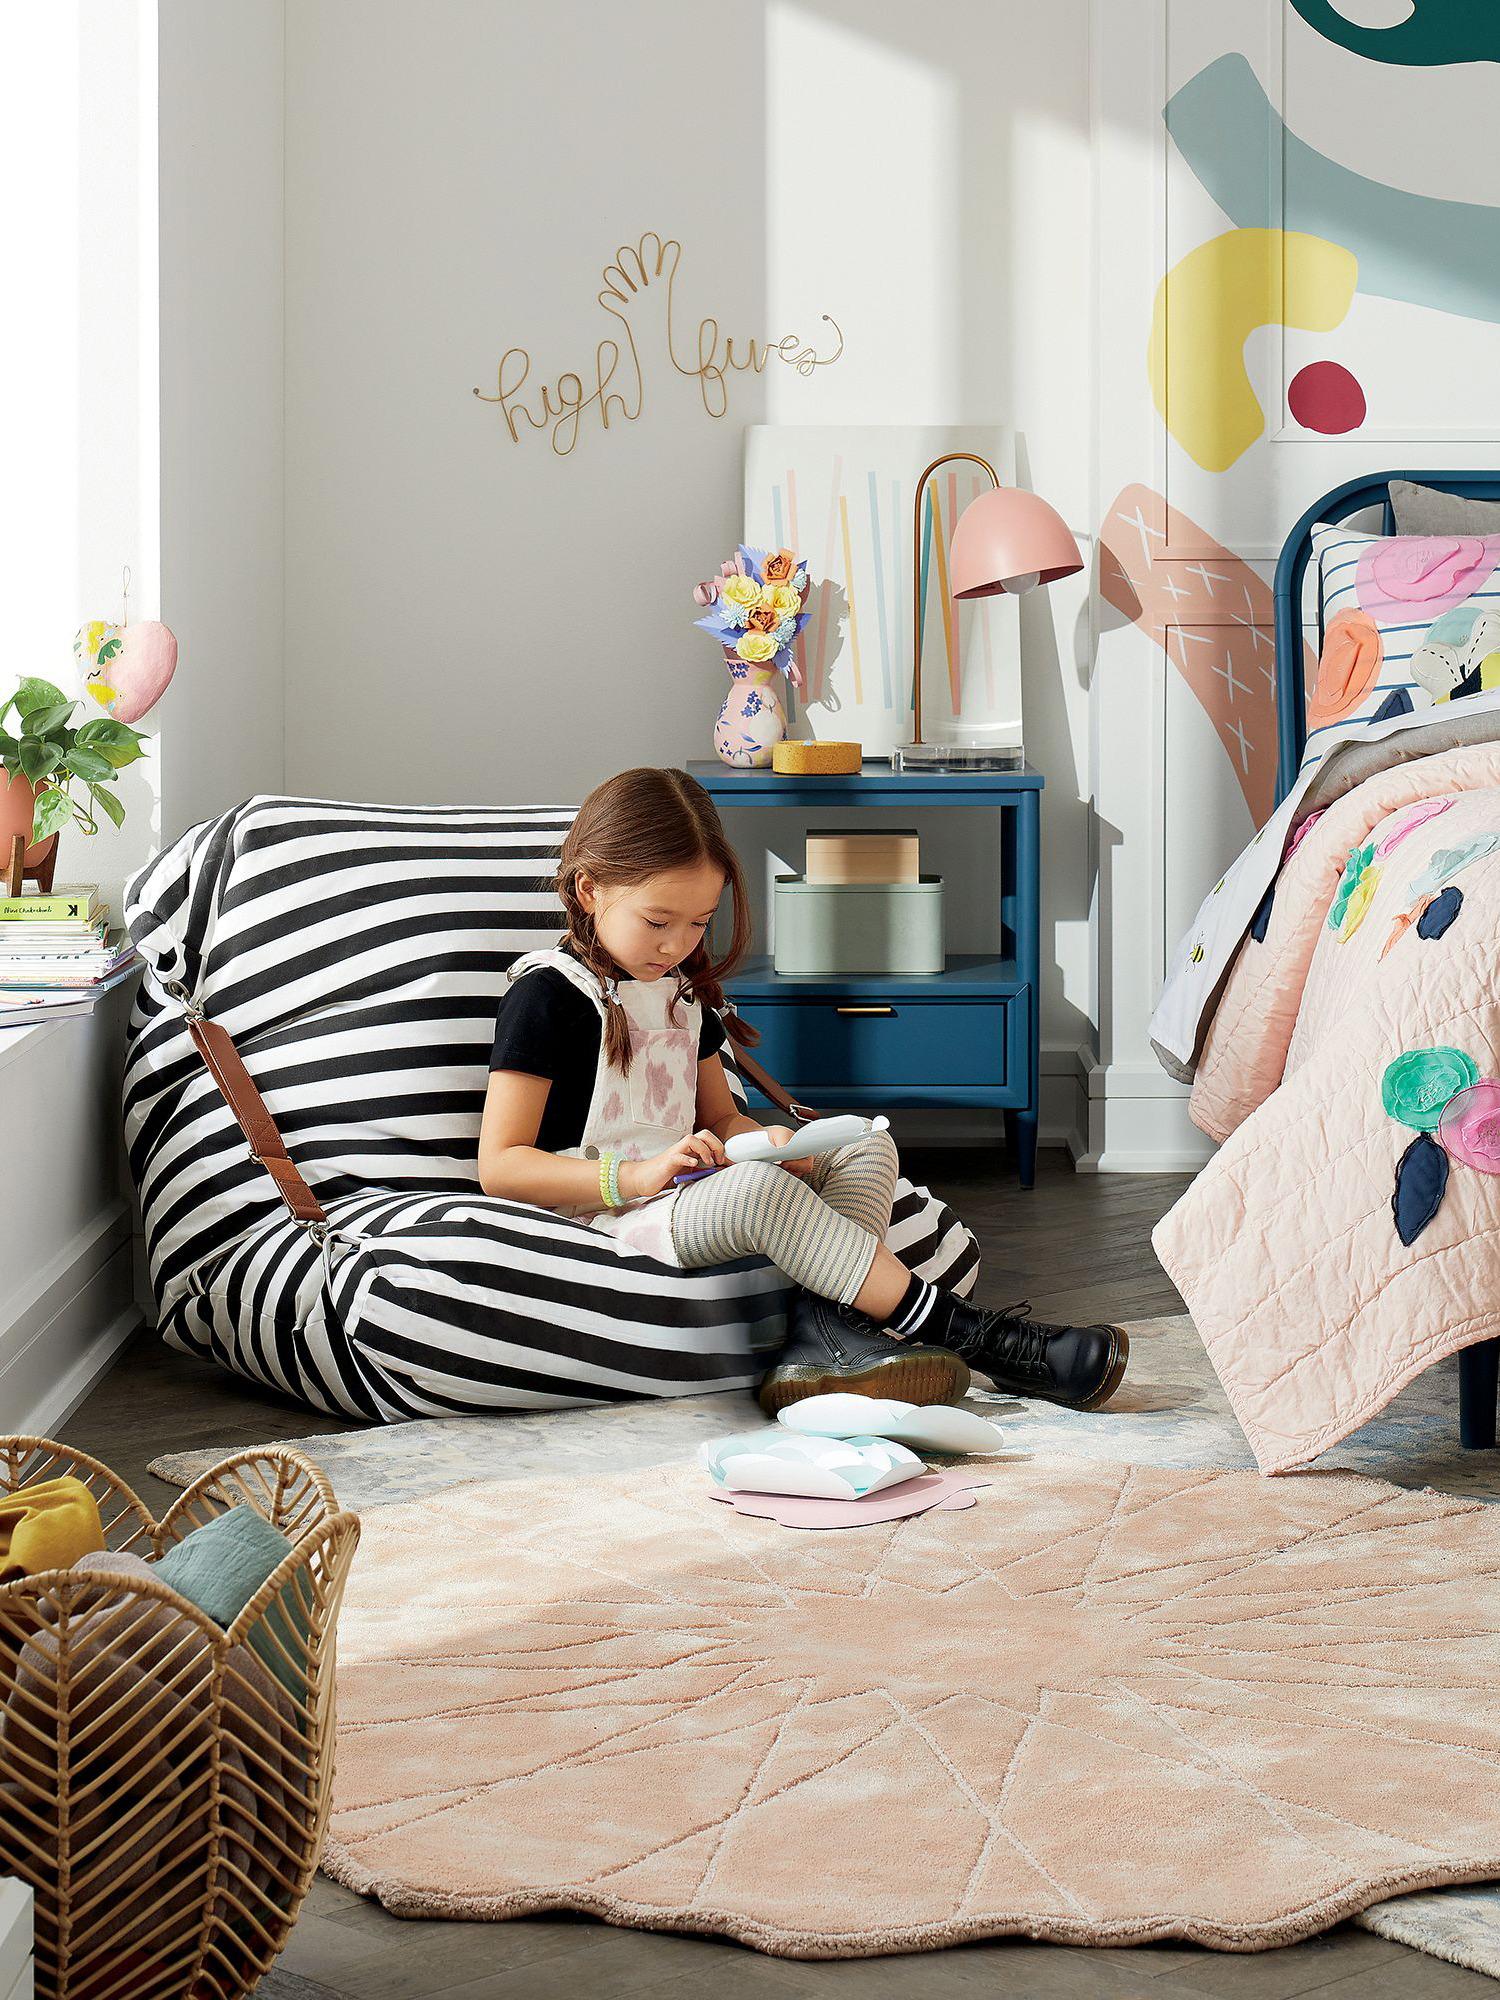 《Crate & Kids》2020春夏儿童&婴幼童家居用品系列Lookbook